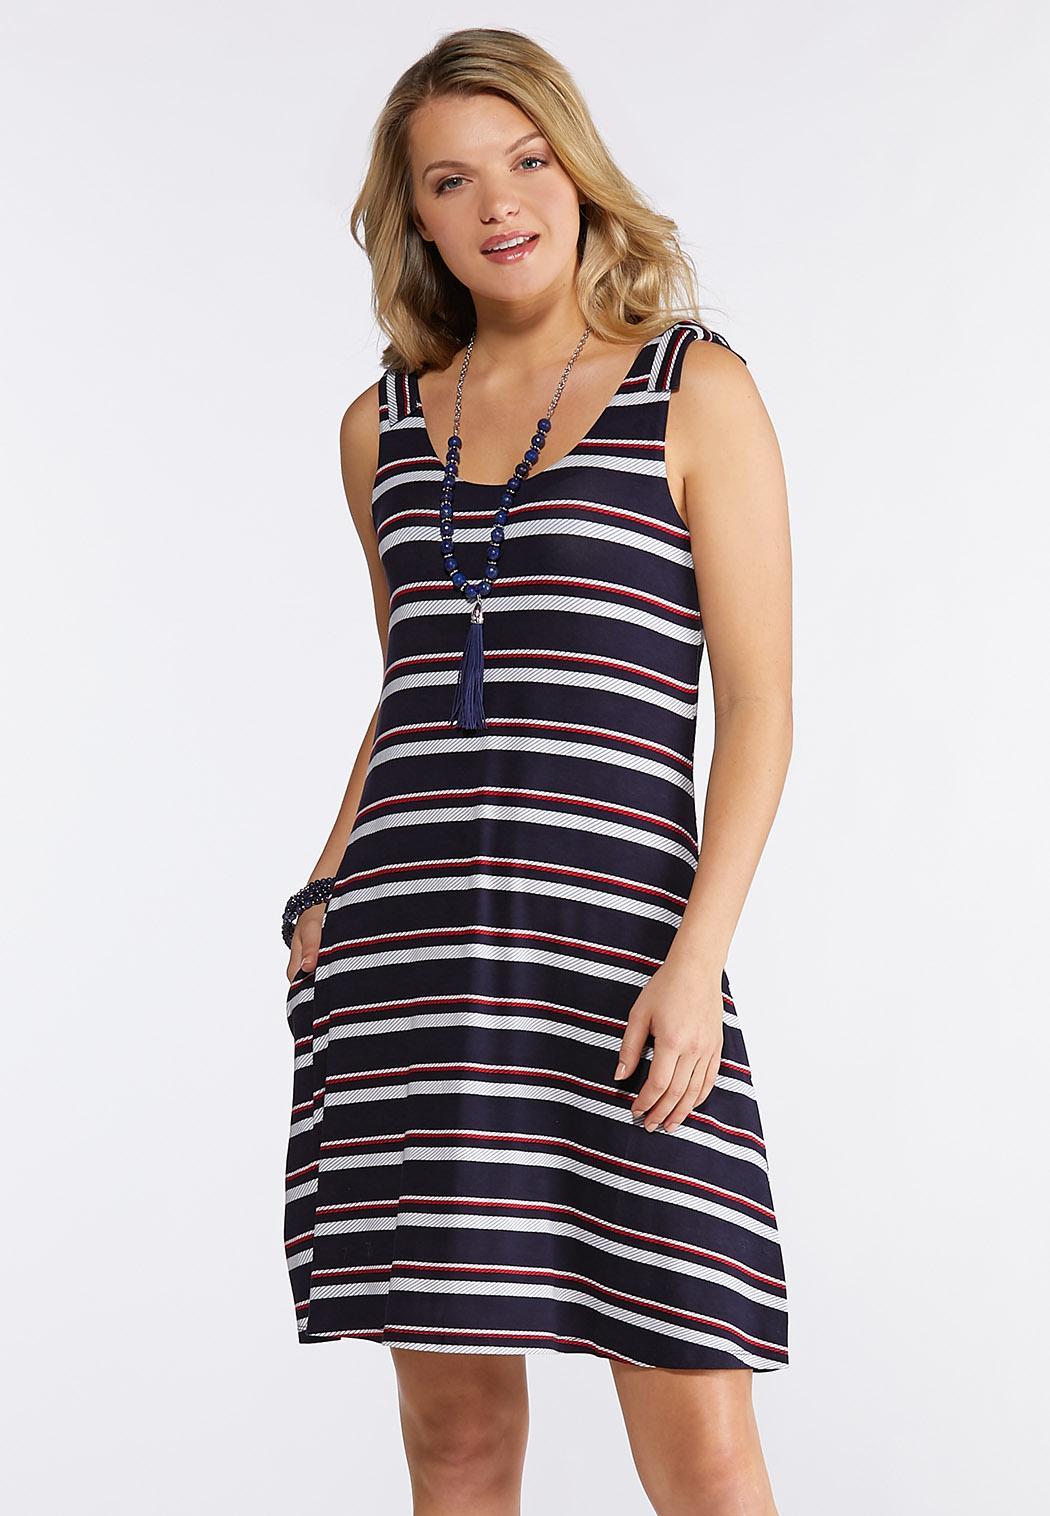 Stripe Tie Shoulder Knit Dress